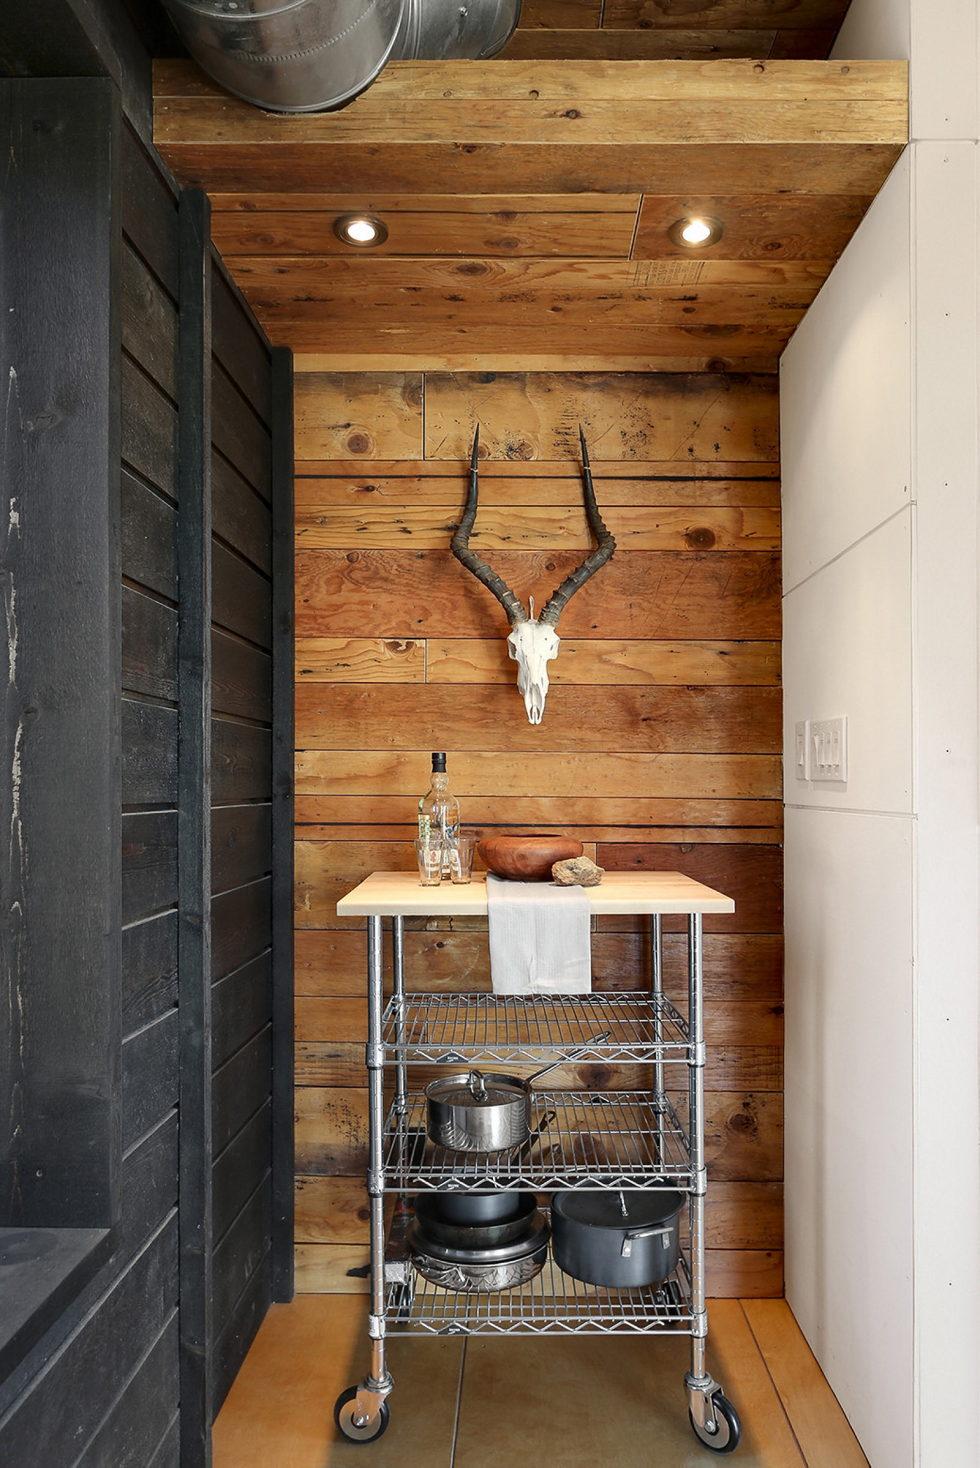 510 Cabin The Country House From Hunter Leggitt Studio In The USA 6